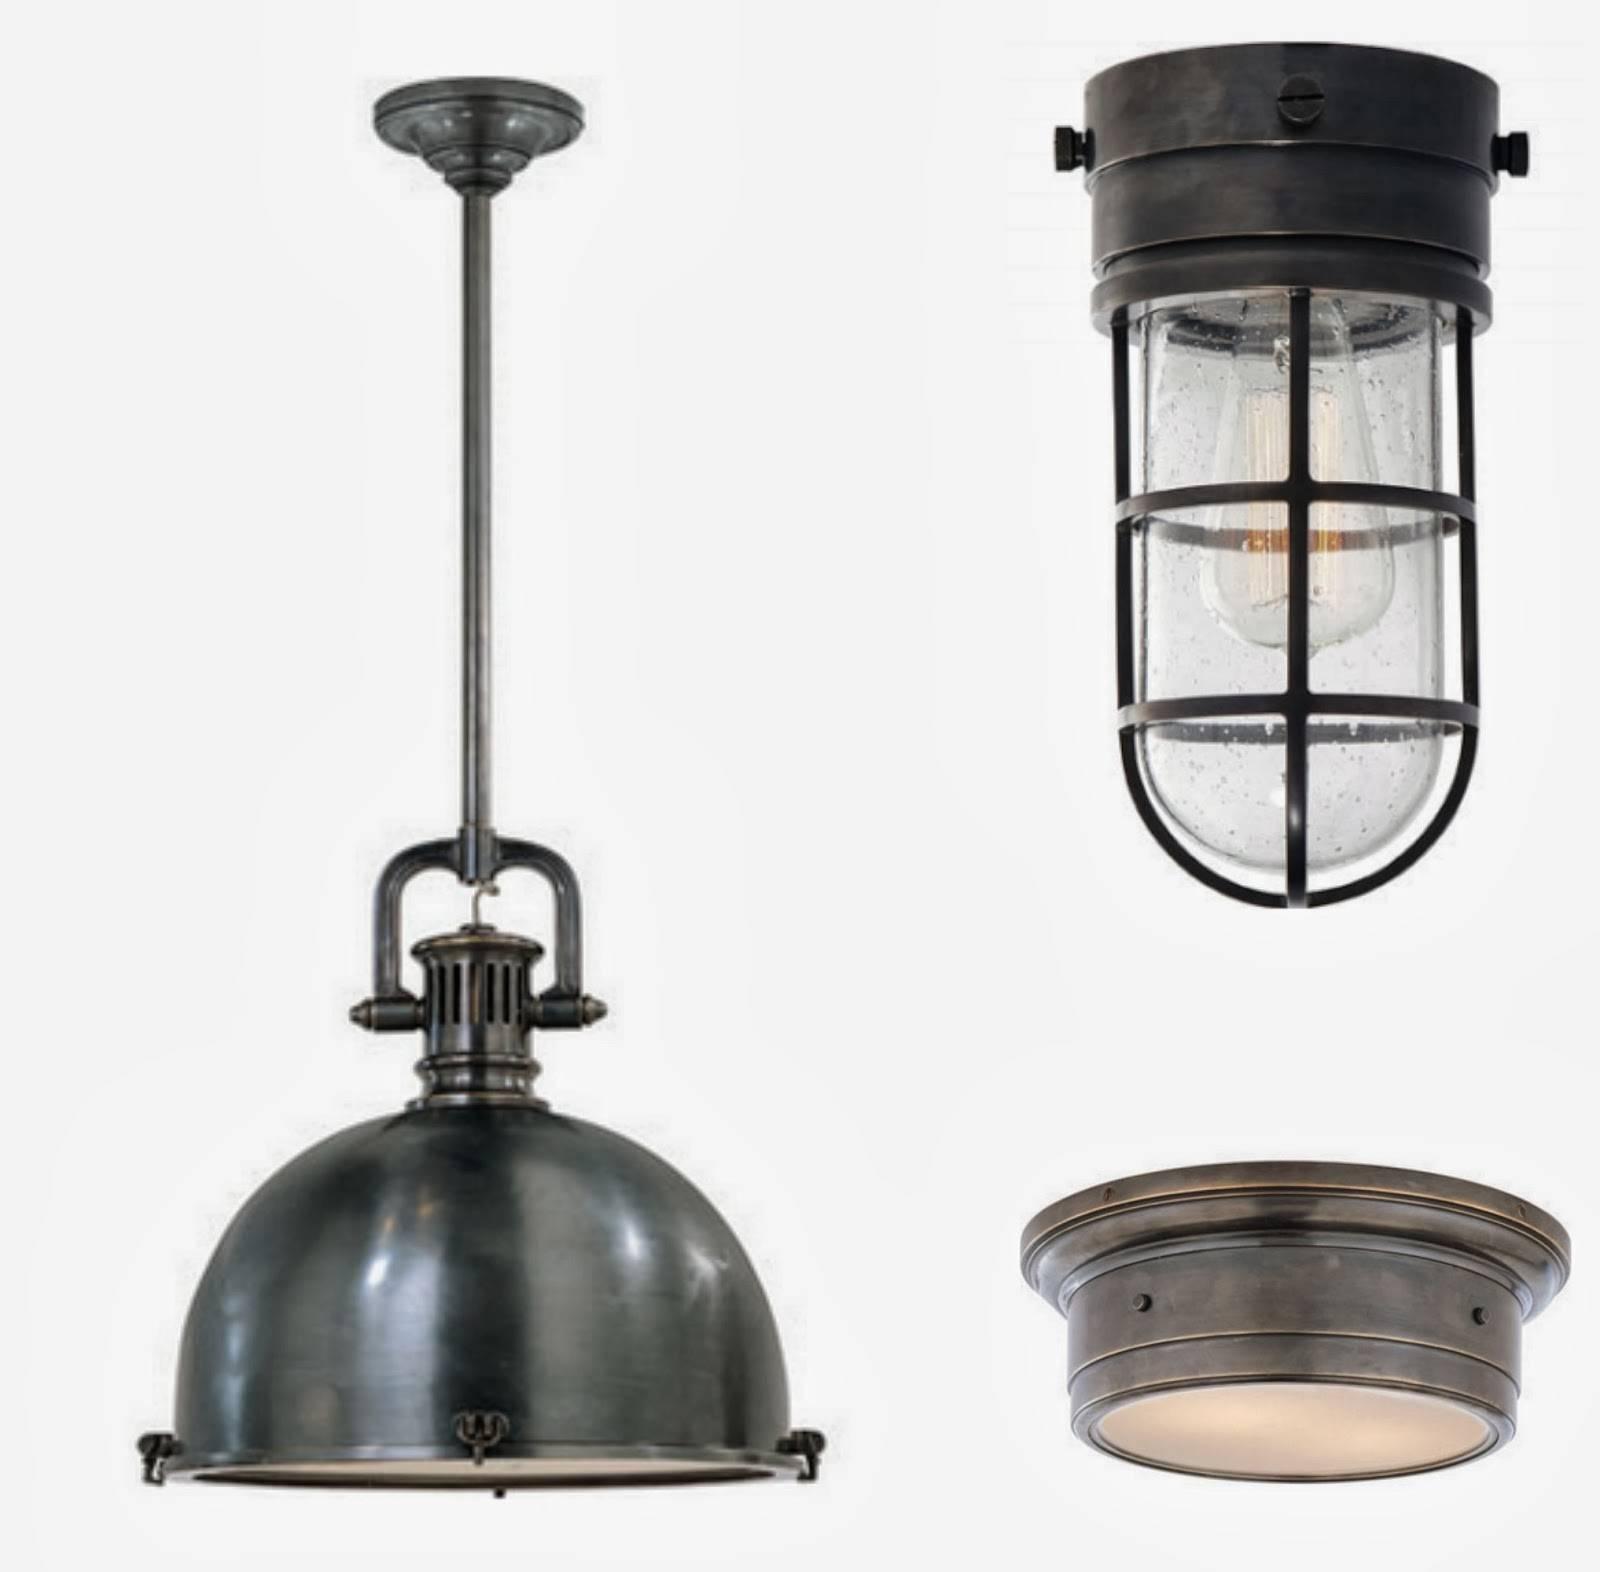 Indoor Light : Coolest Nautical Pendant Lighting Indoor , Nautical with regard to Indoor Nautical Pendant Lighting (Image 3 of 15)